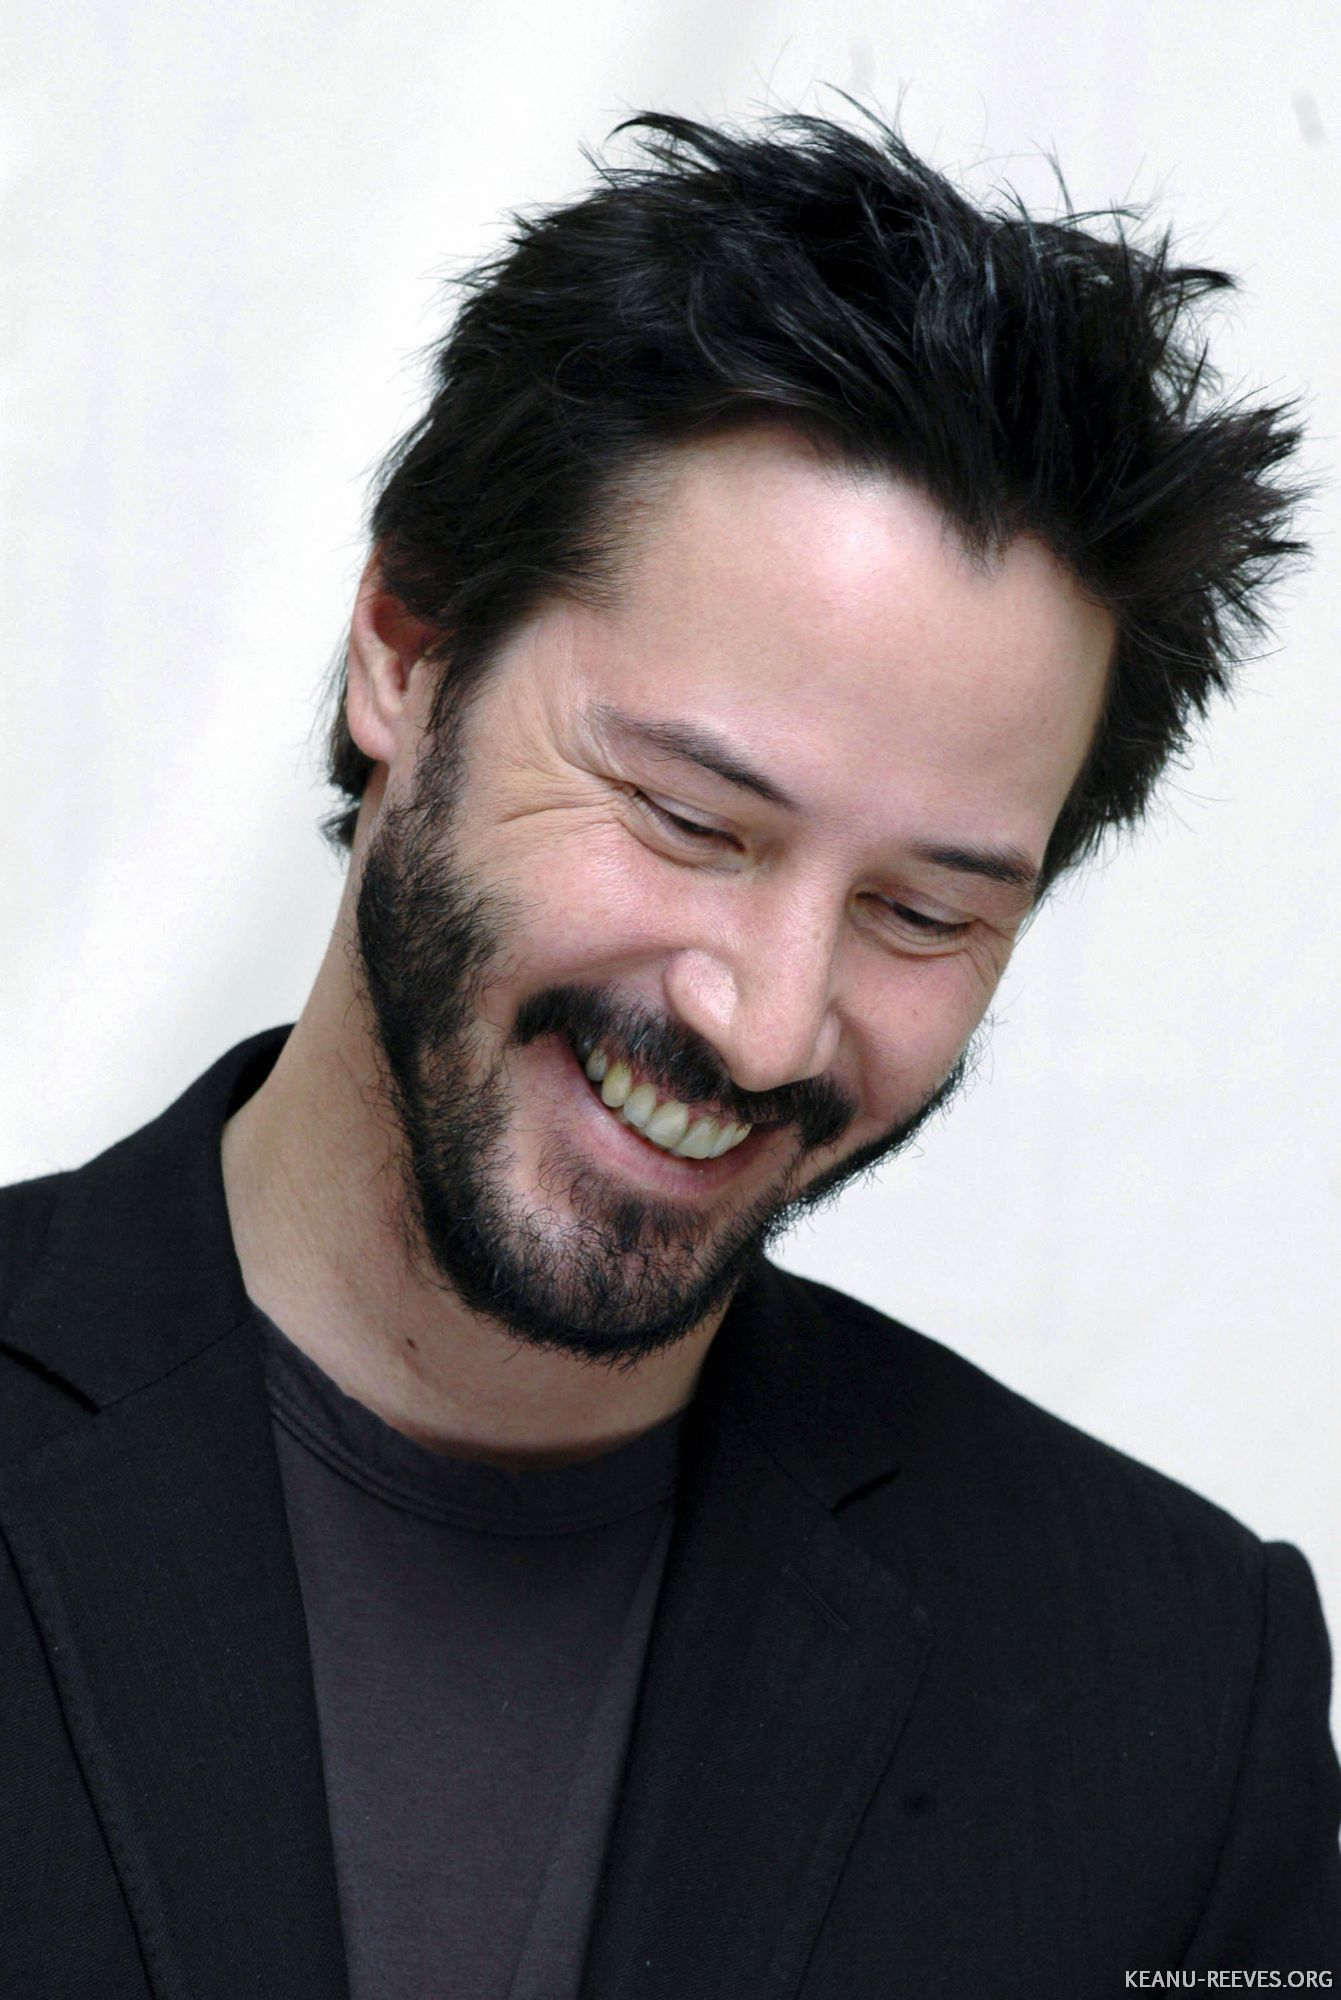 Joey degraw dating kendra jade 2005